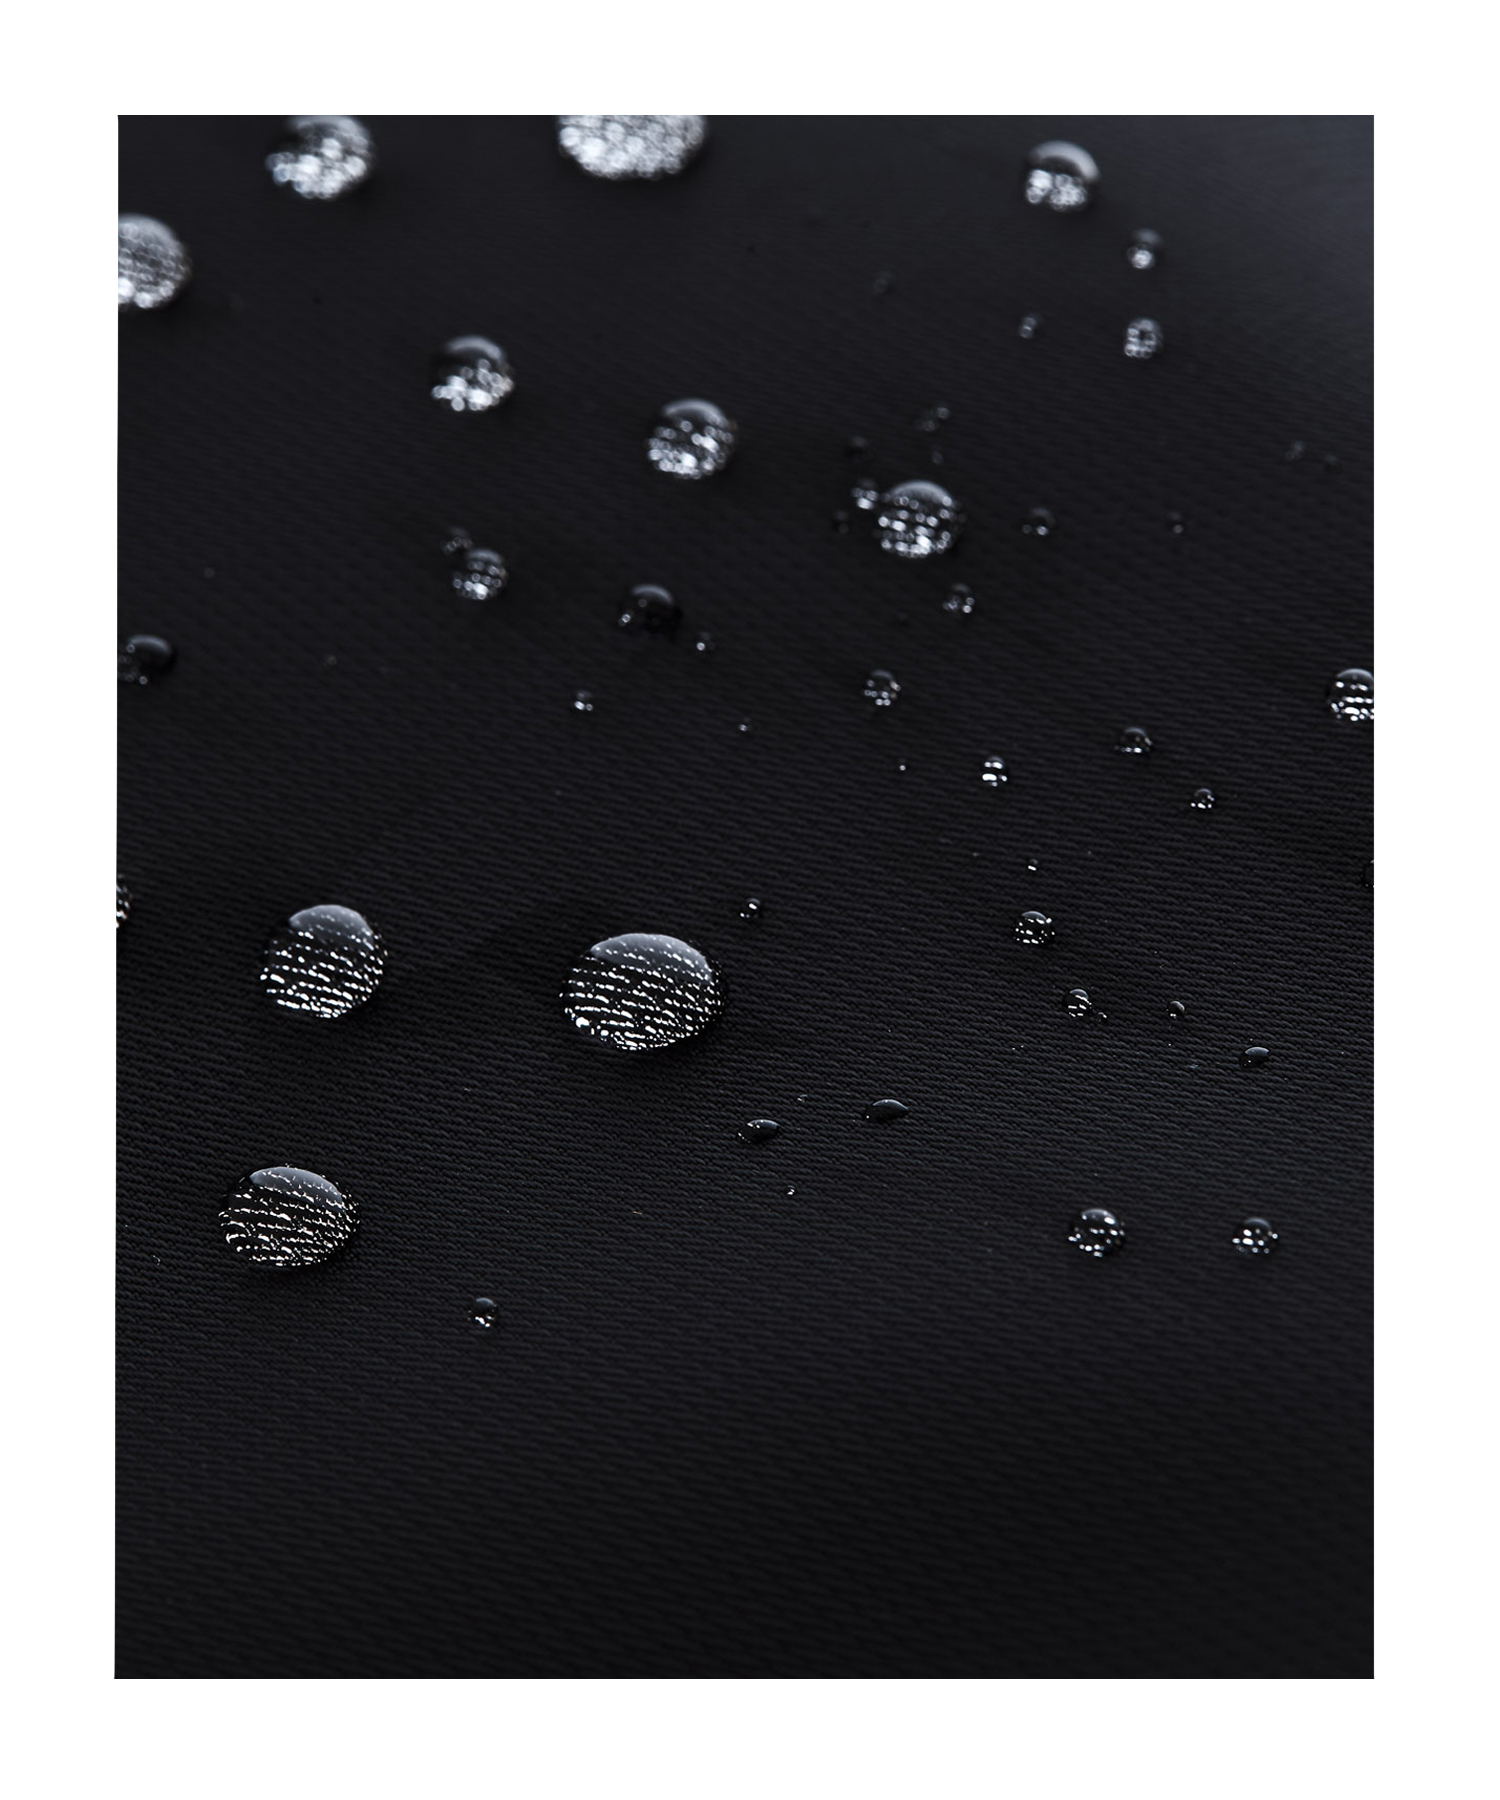 Krimcode water repellent technology